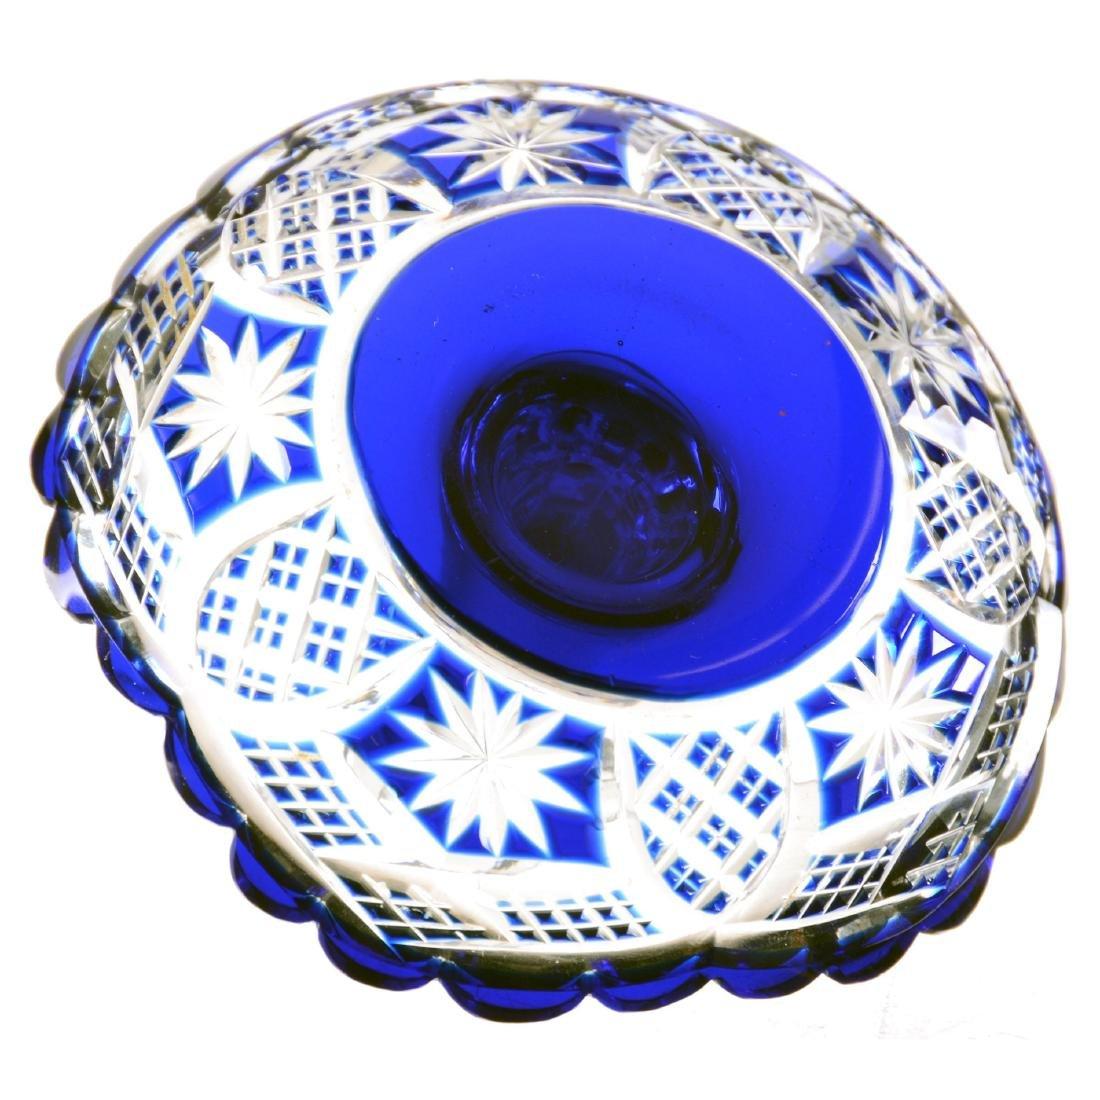 "Stick Dish - 3.5"" X 4"" - Cobalt Blue Cut to Clear - 2"